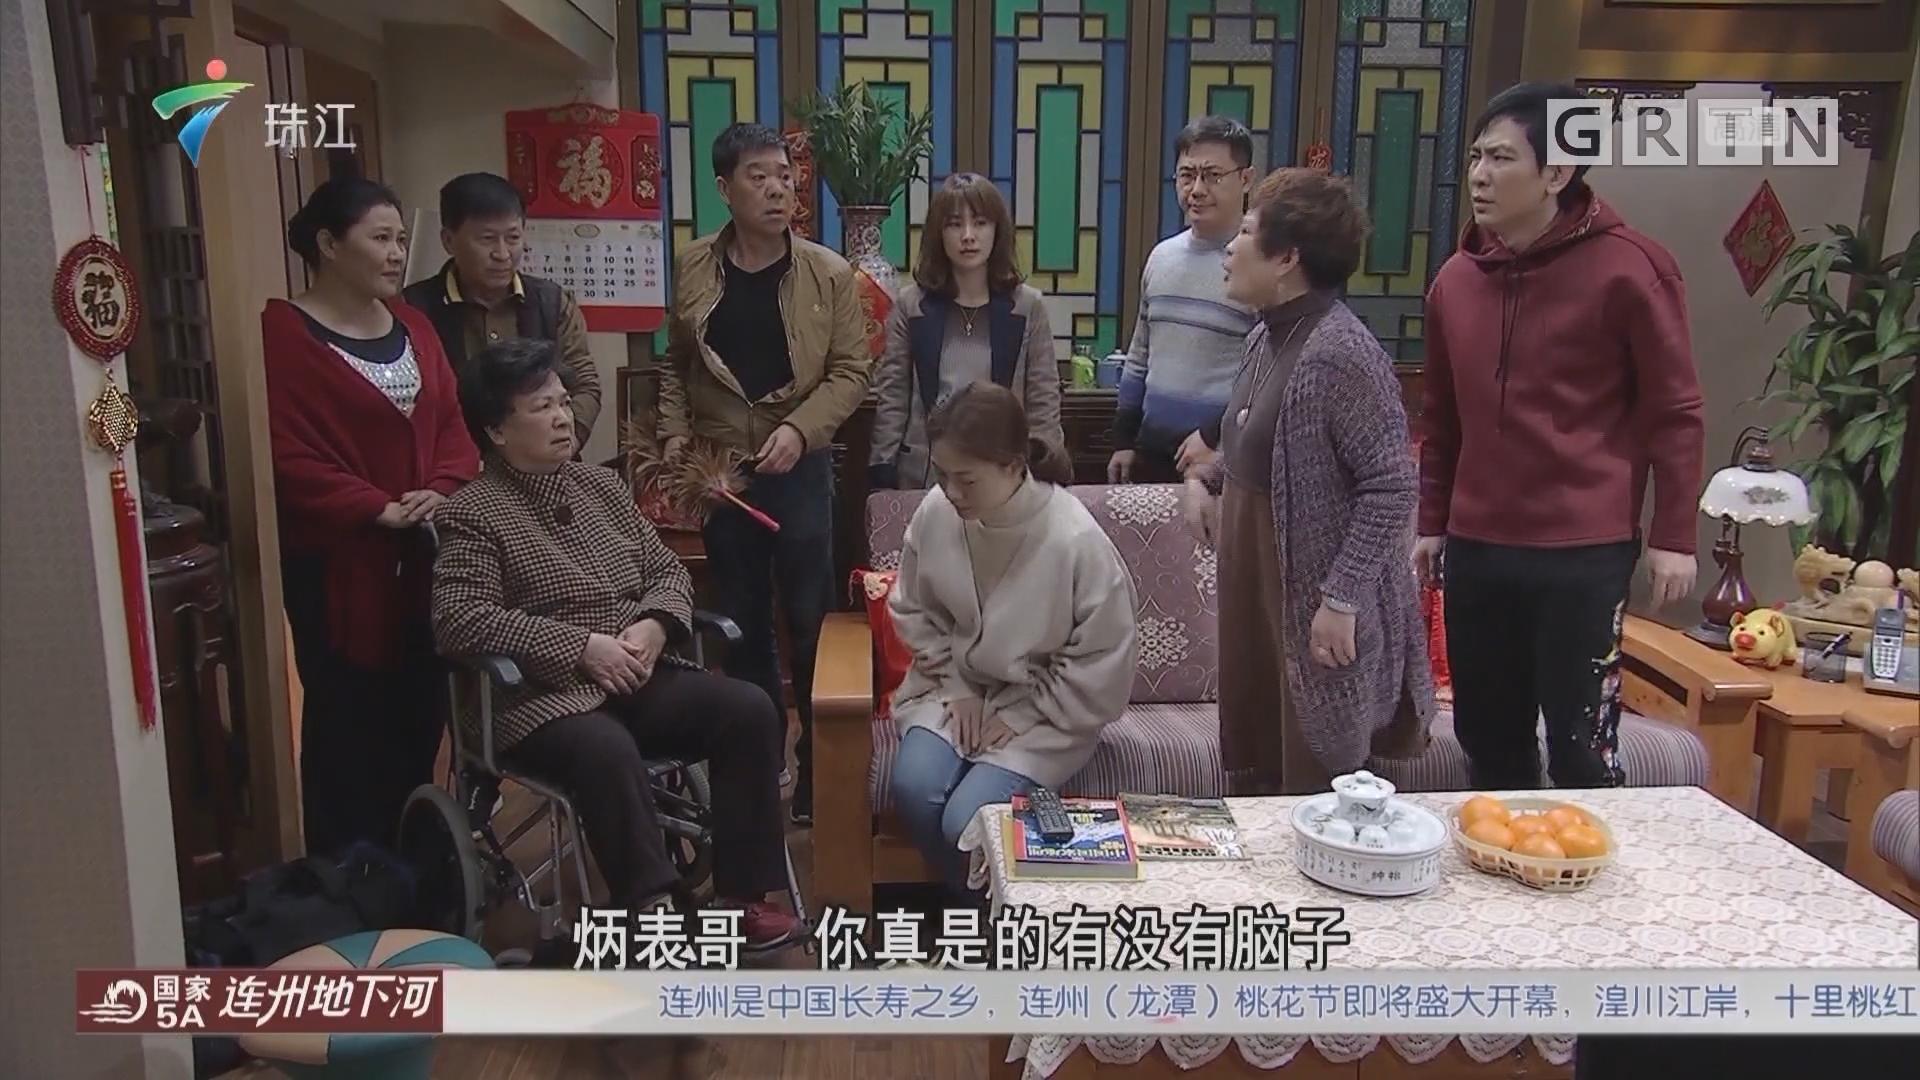 [HD][2019-02-16]外来媳妇本地郎:新养老主义(上)